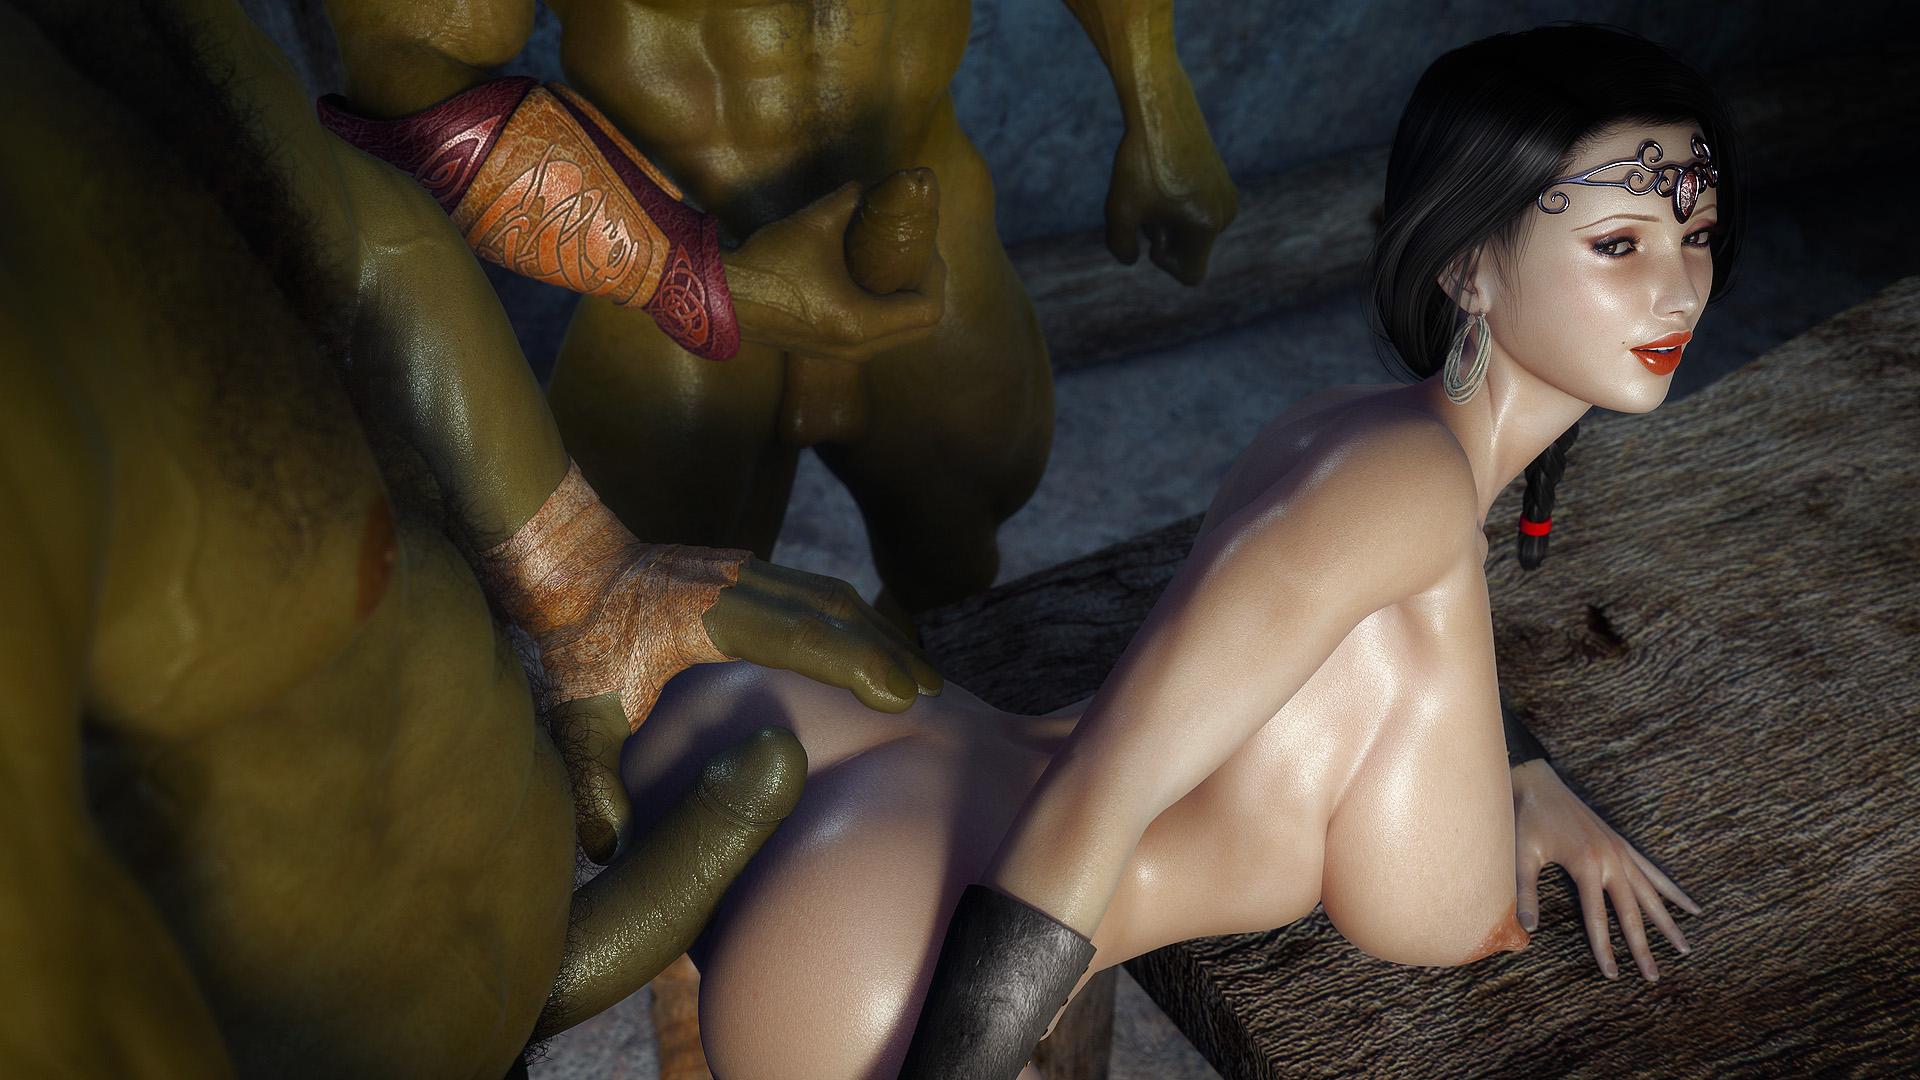 Worldof porn nude film